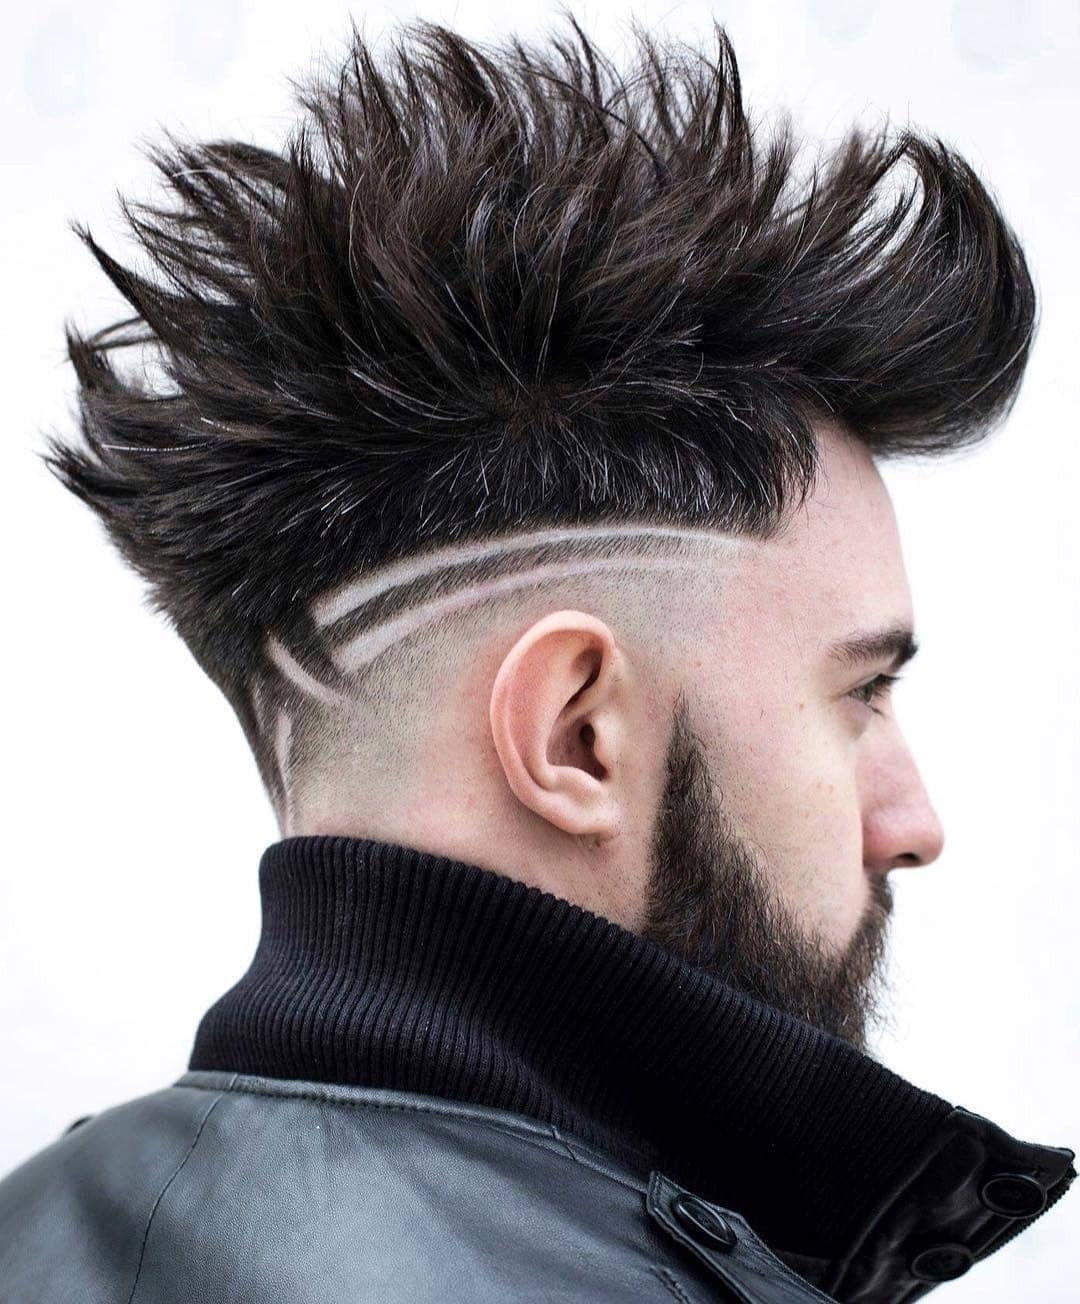 Pin By Mensfashion Vip On Undercut Gents Hair Style Mens Facial Hair Styles Mens Haircuts Short Hair